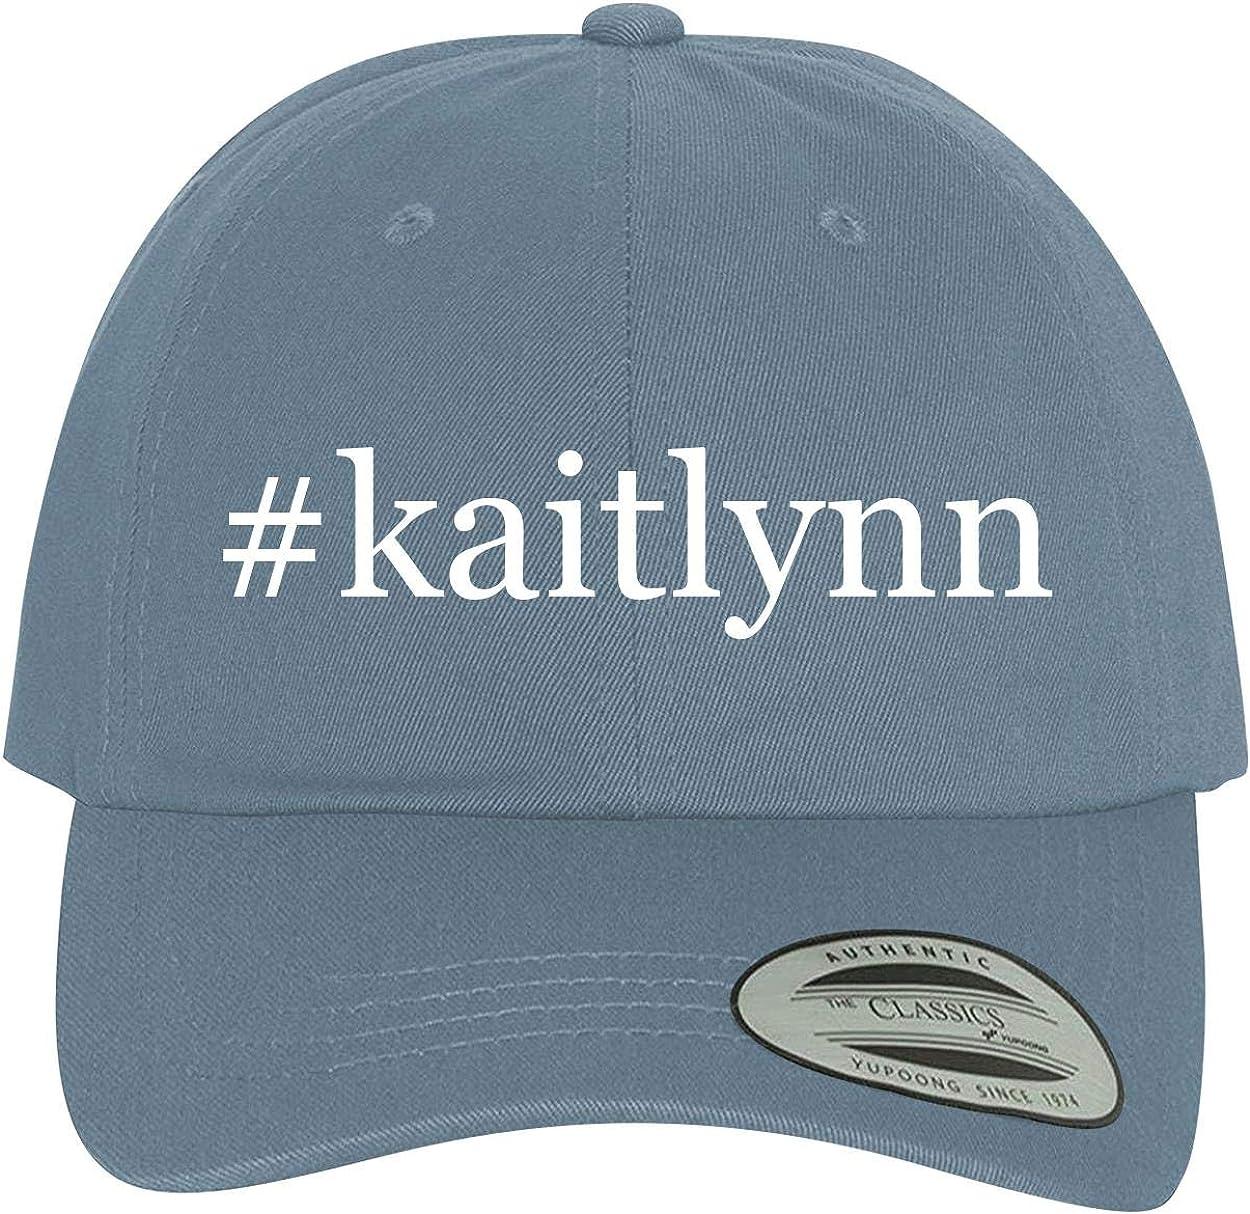 Comfortable Dad Hat Baseball Cap BH Cool Designs #Kaitlynn